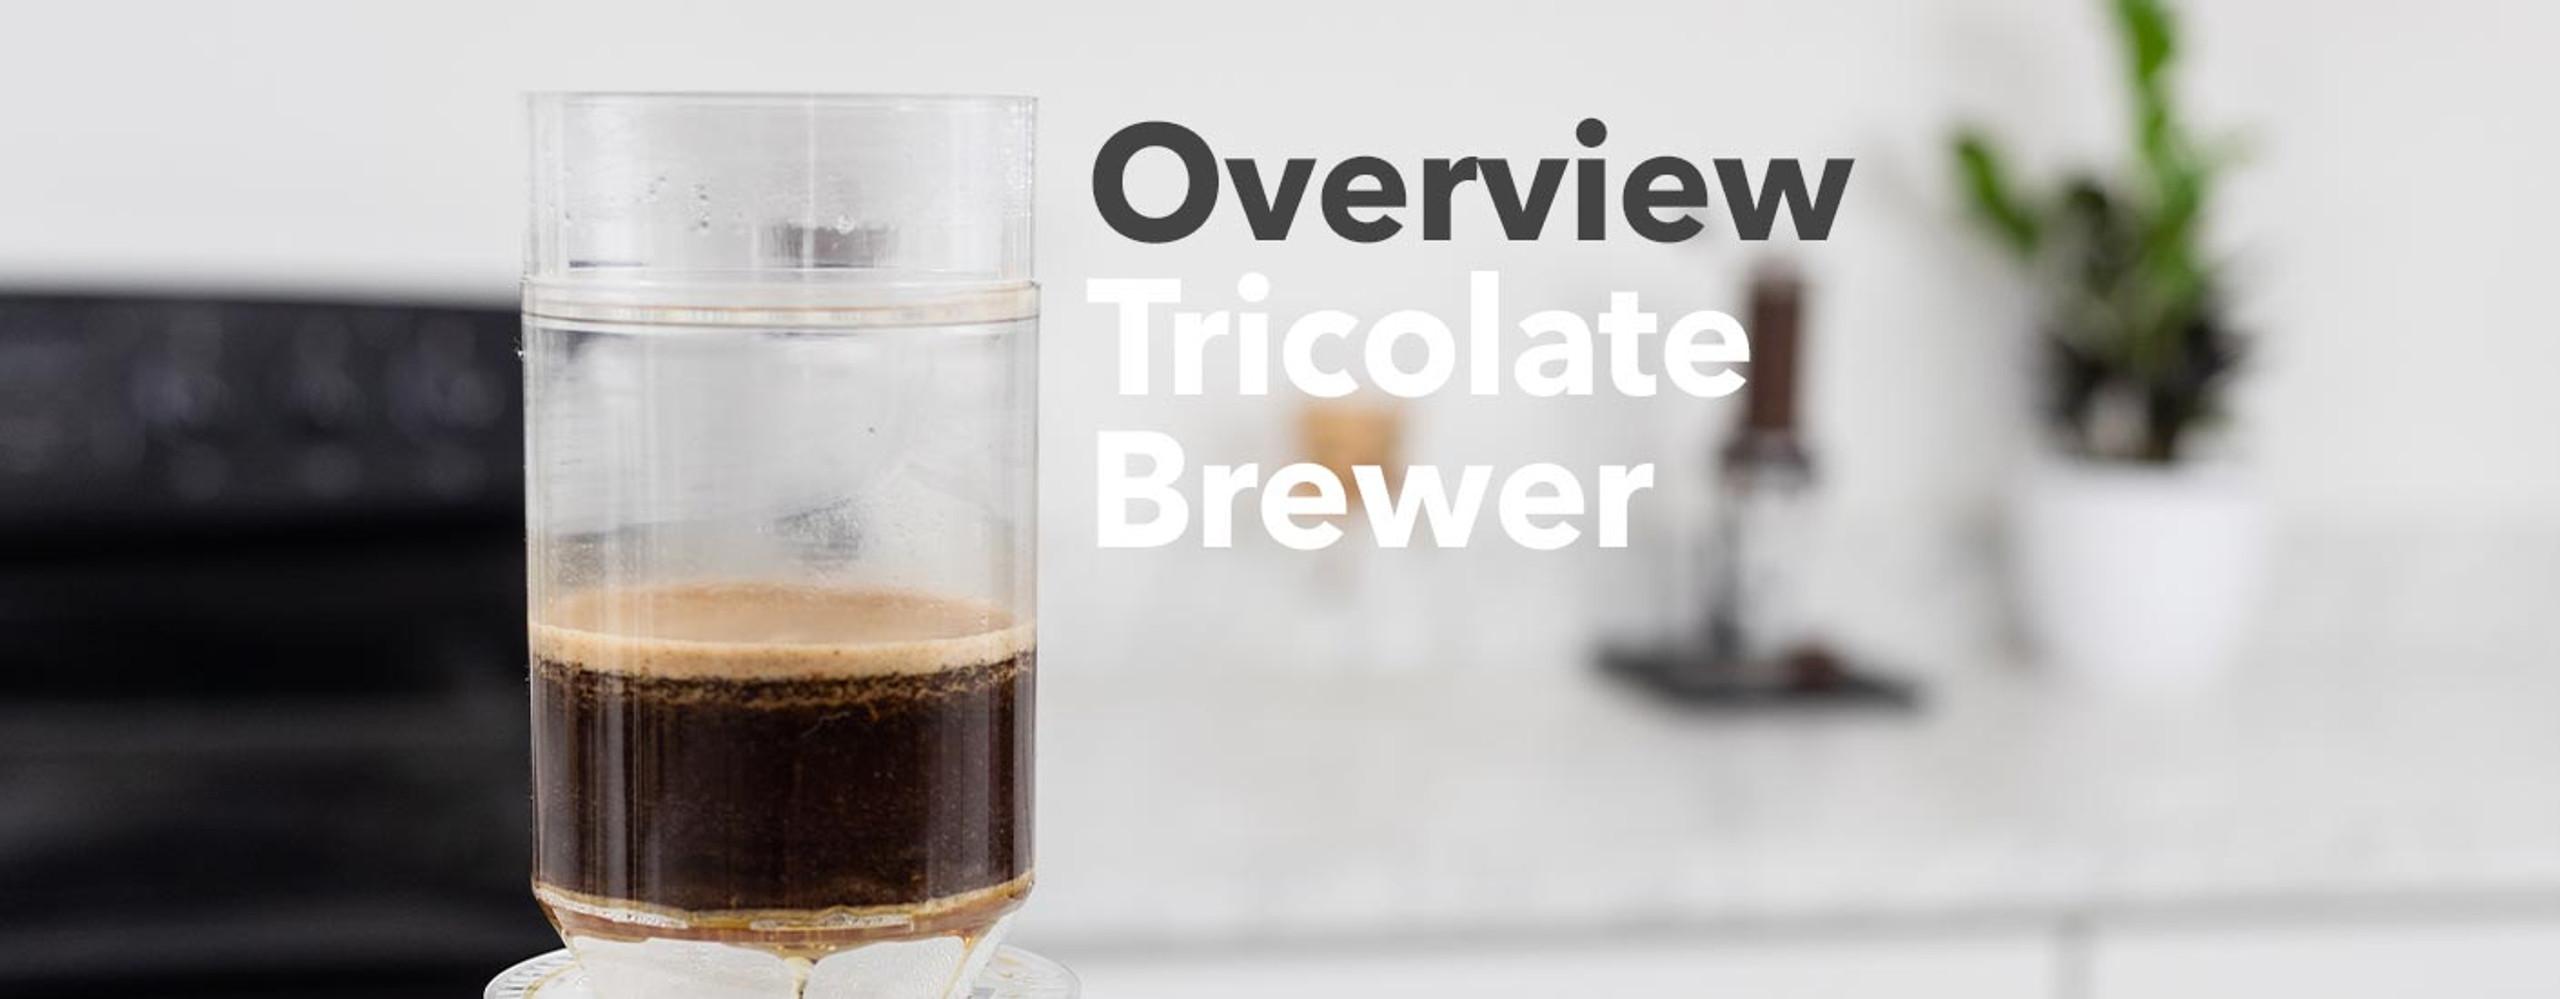 Tricolate Brewer